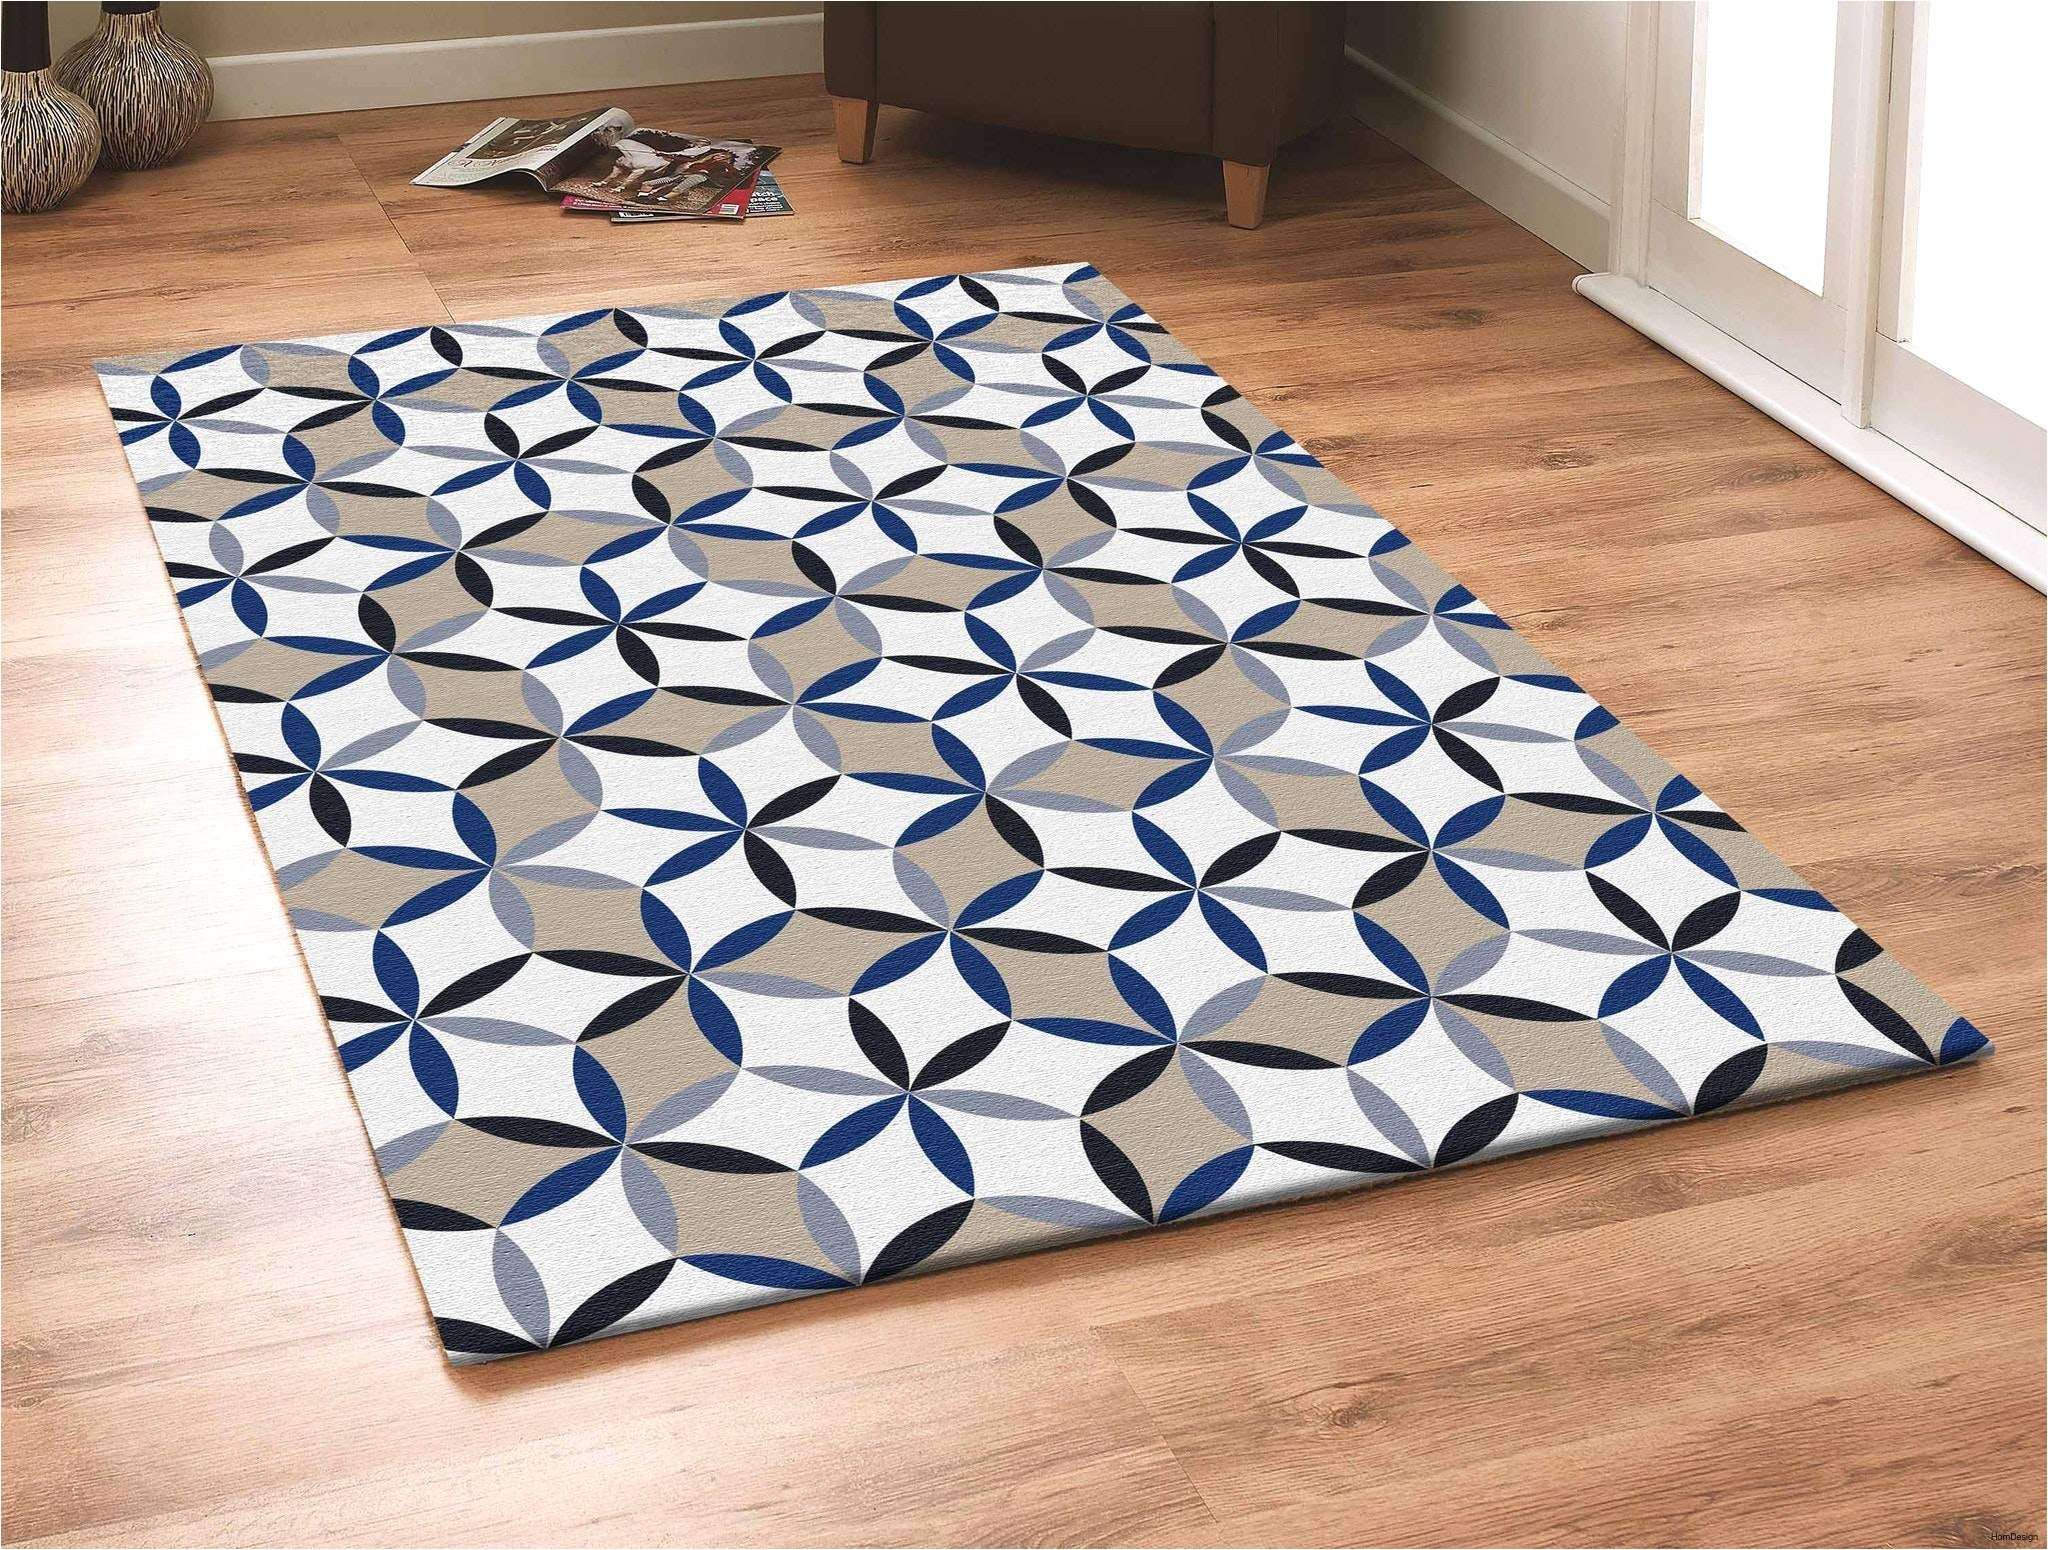 33 greatest black round area rugs